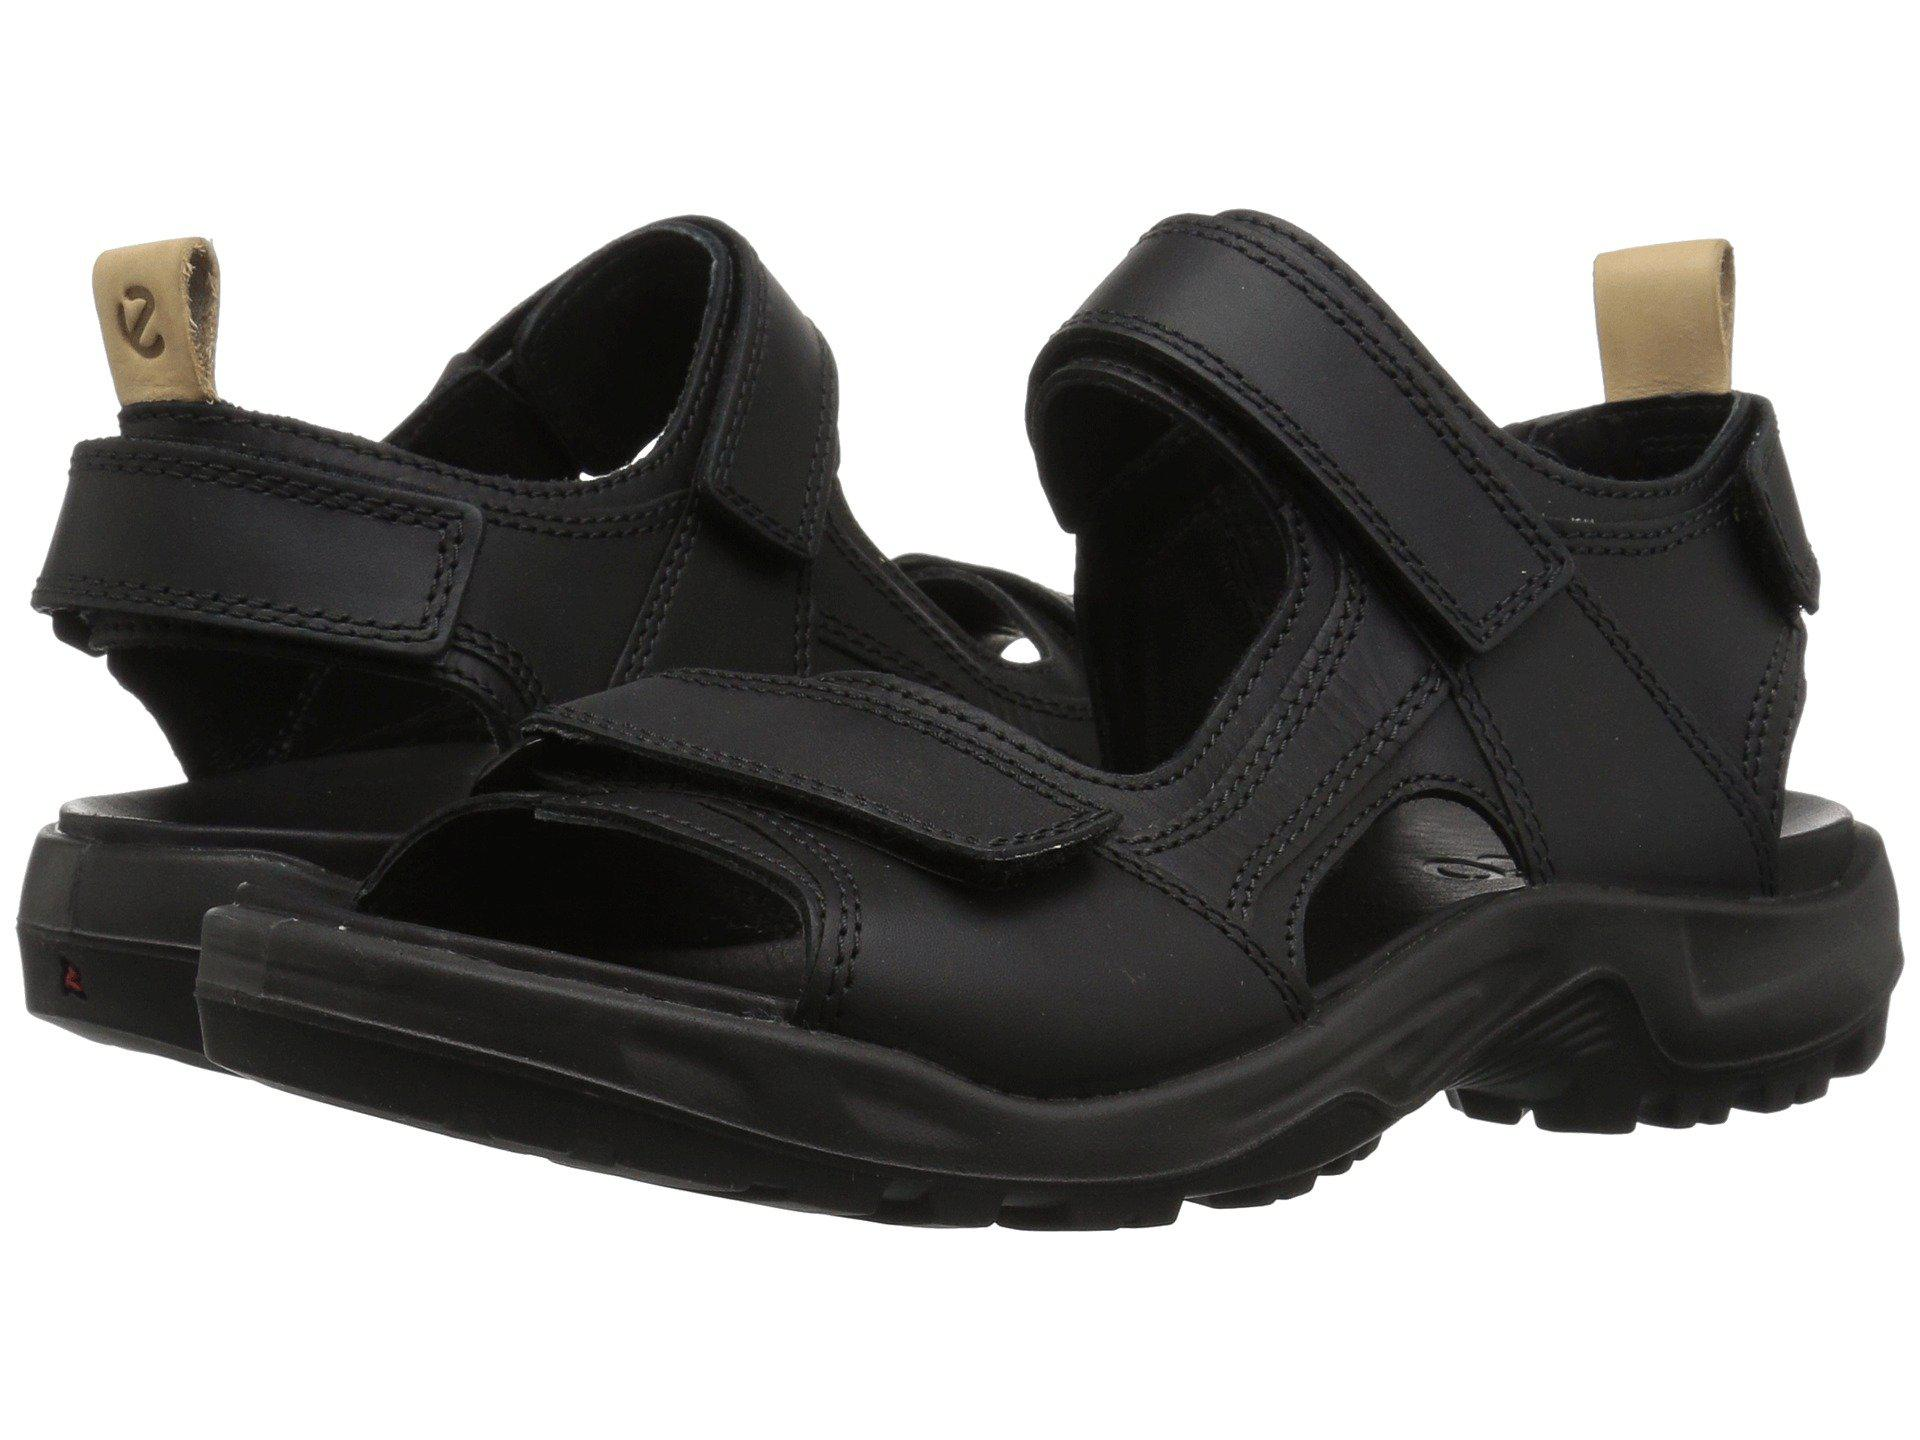 0132df6ec595 Lyst - Ecco Offroad 2.0 Sandal (black powder) Men s Sandals in Black ...